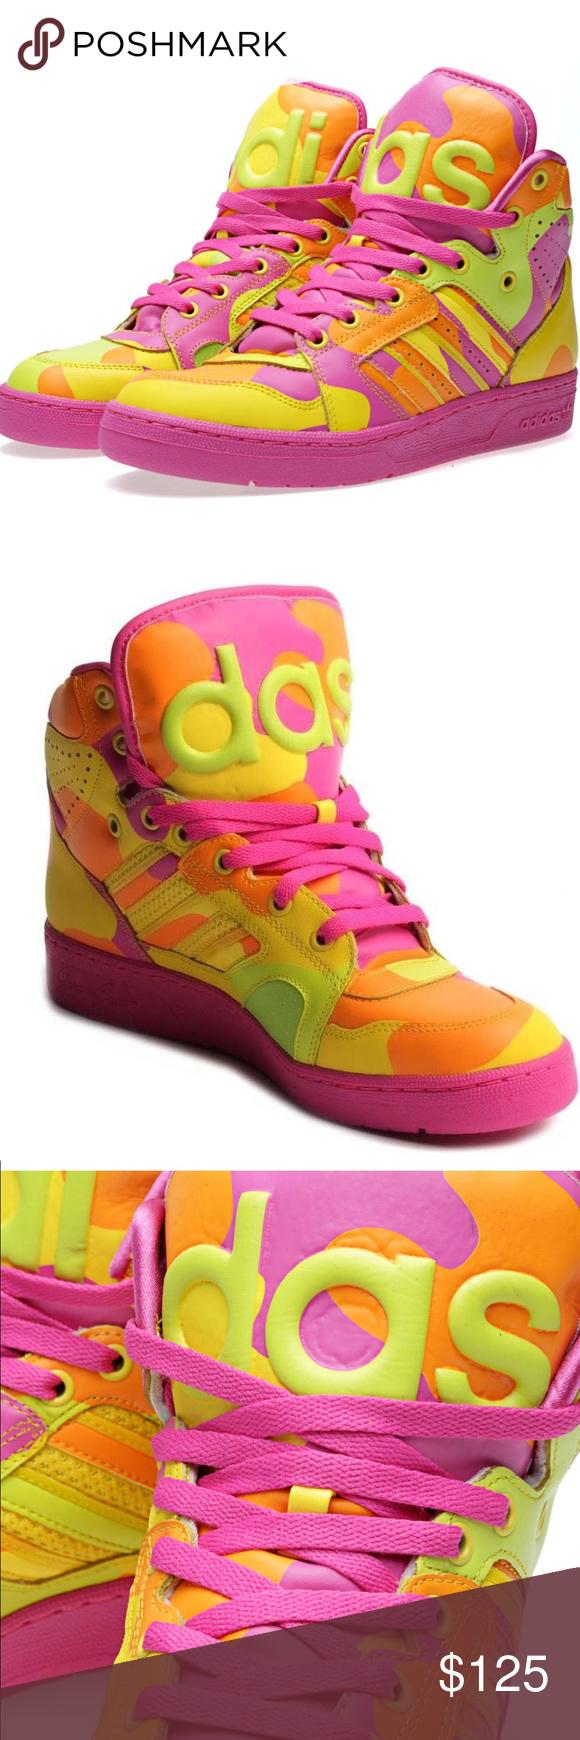 sports shoes e68cf 98685 RARE ADIDAS JEREMY SCOTT INSTINCT HI NEON CAMO The latest re-design of the  hugely